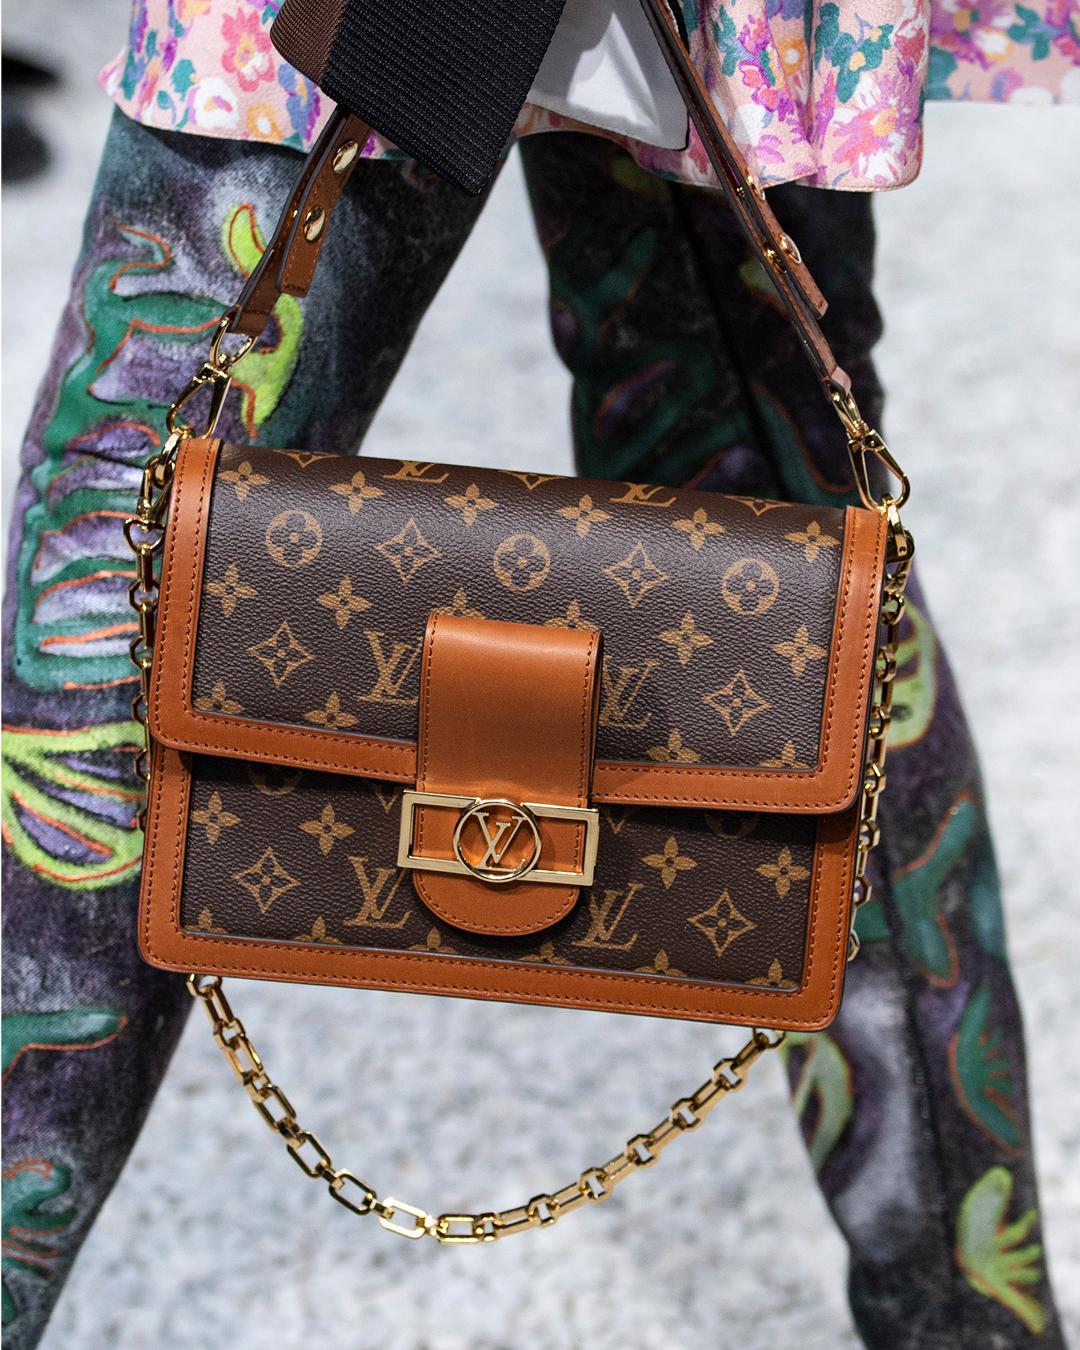 8b552a68f4e6 A closer look at a monogram handbag from the Louis Vuitton Cruise 2019  Collection by Nicolas Ghesquiere